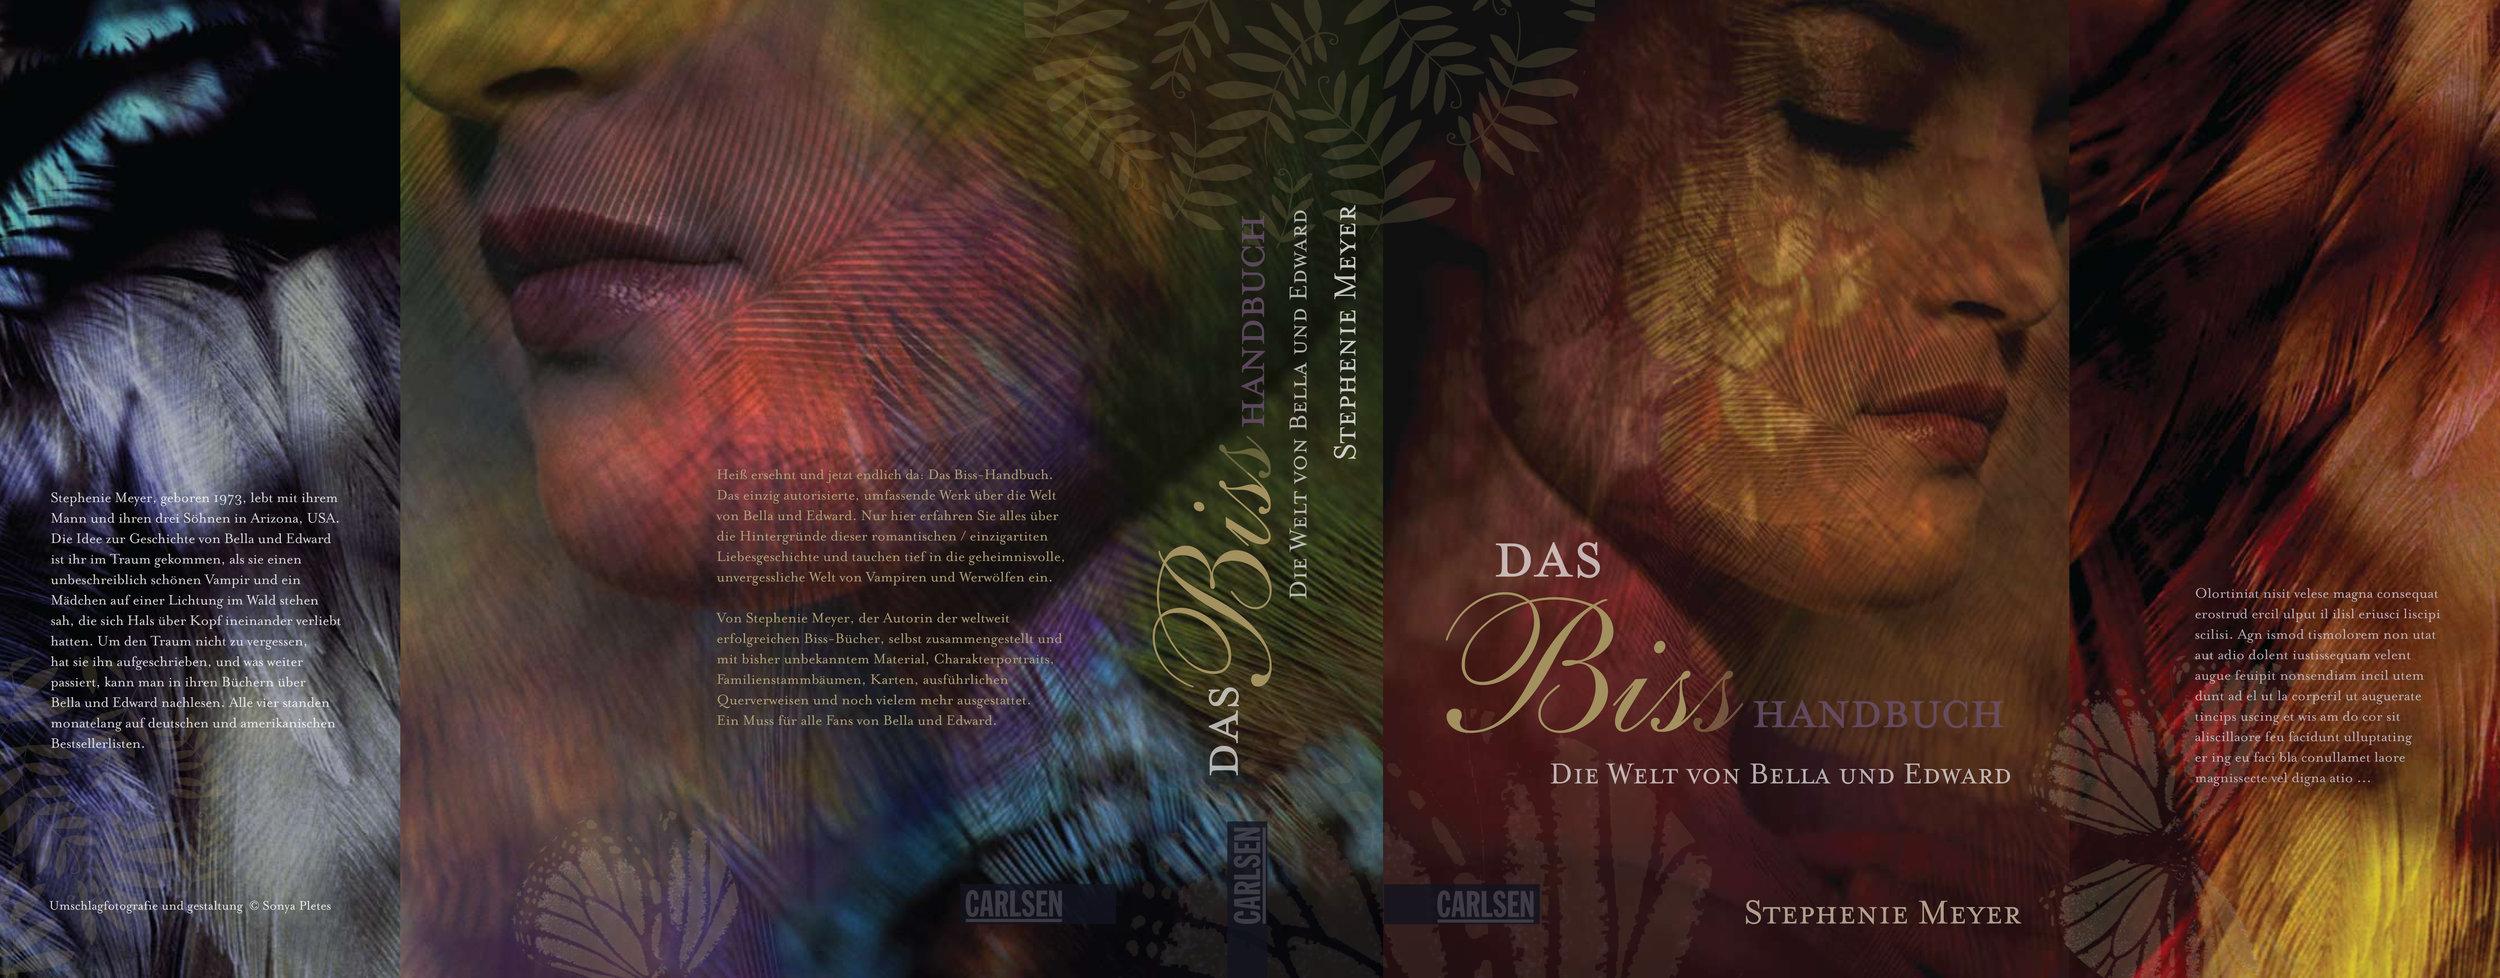 'The Twilight Saga, Guide Book'   by Stephenie Meyer. German Language Edition, Carlsen Verlag, Hamburg.  Design, Photography & Creative Direction © Sonya Pletes